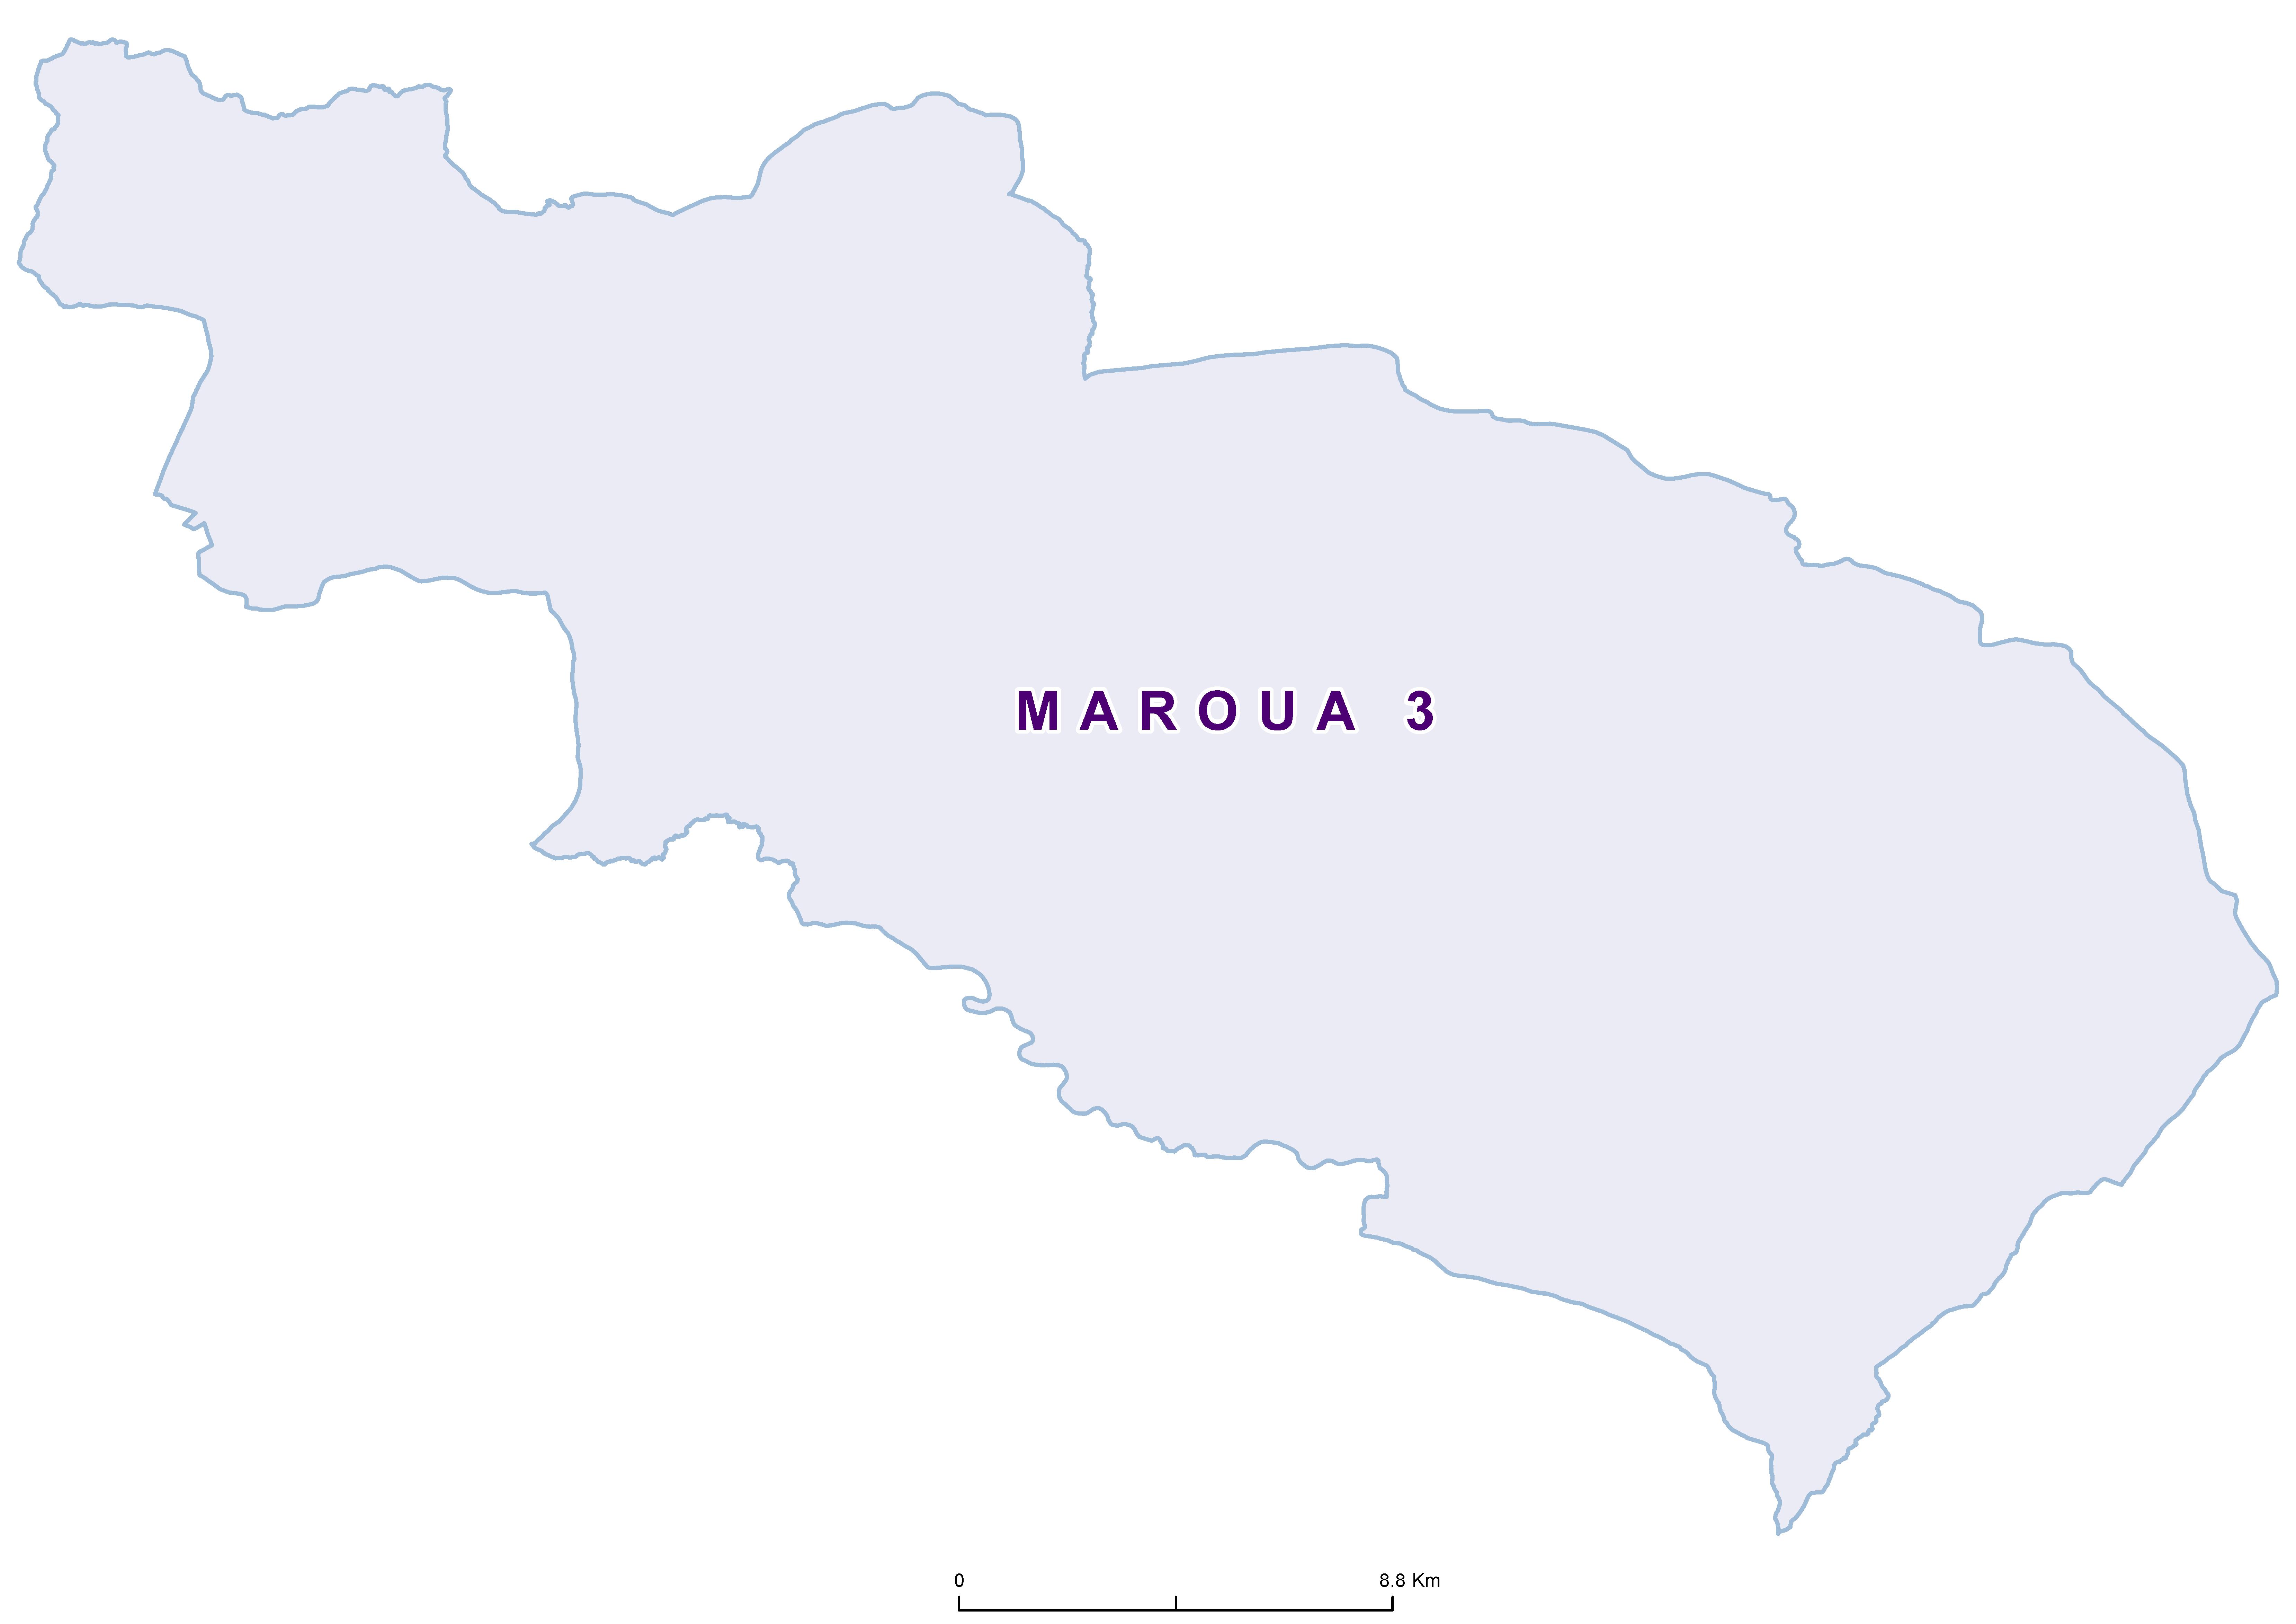 Maroua 3 Mean SCH 20180001